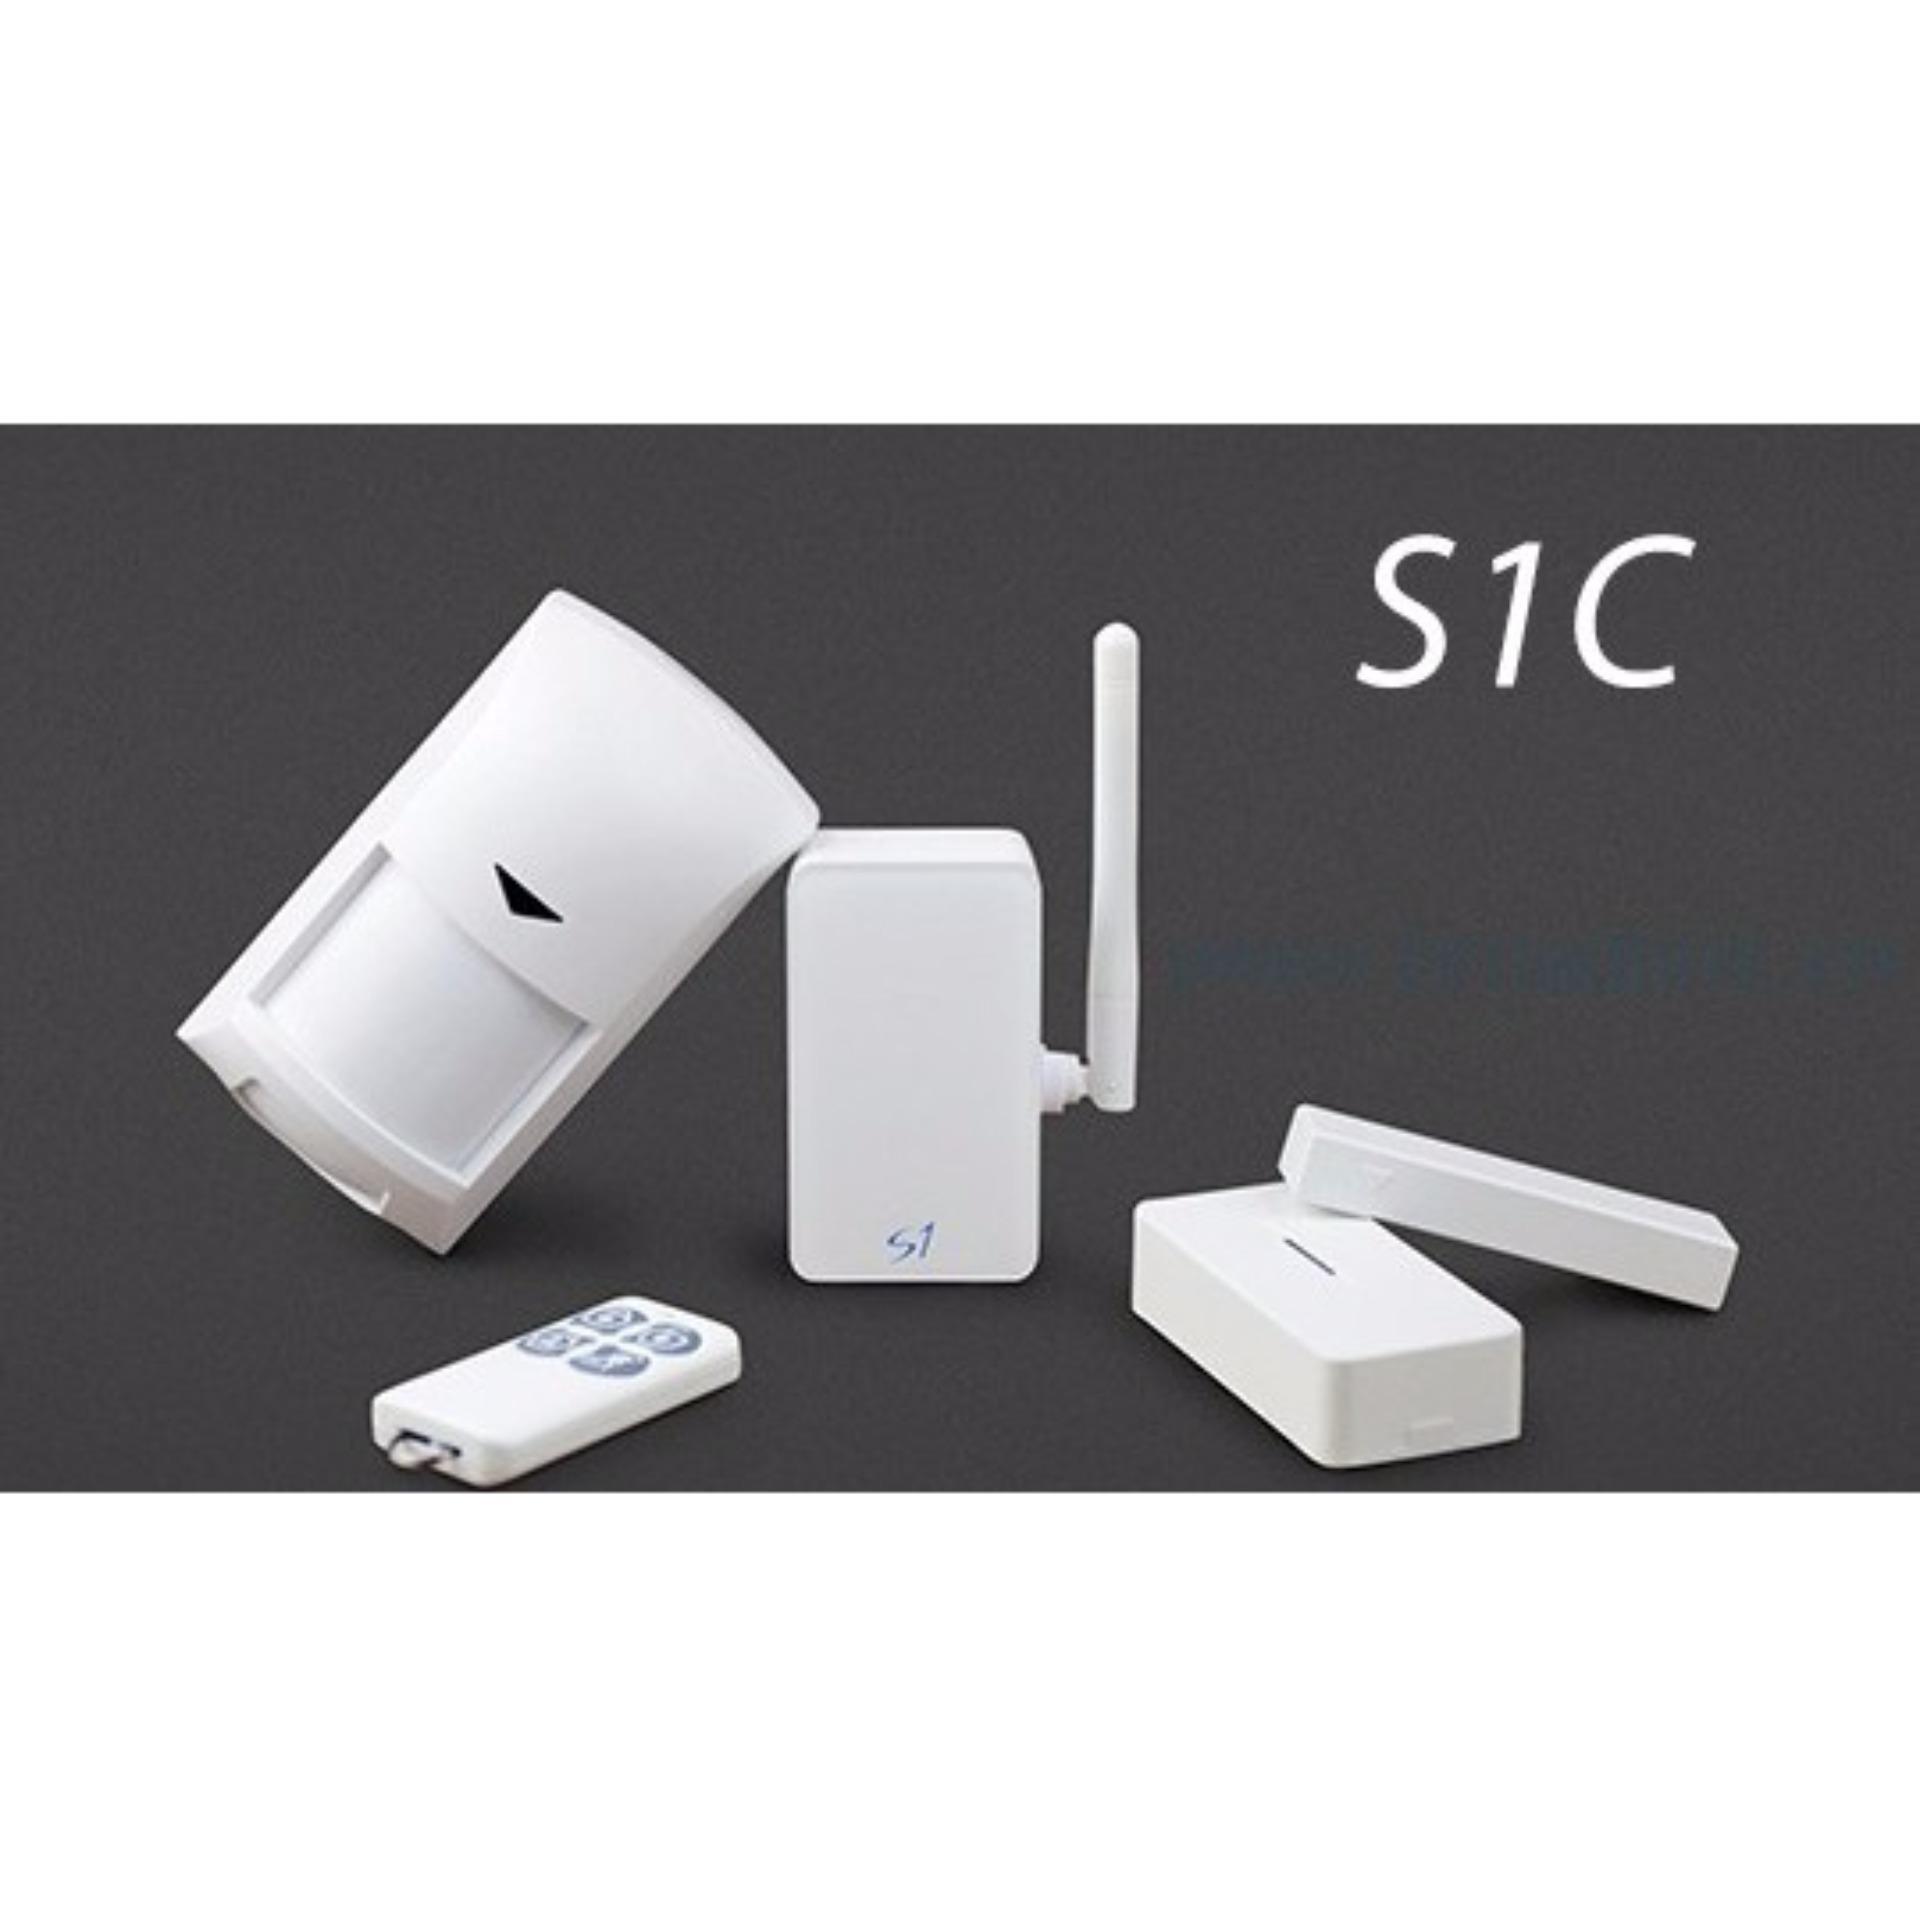 Trung tâm kiểm soát an ninh Broadlink SmartONE S1C